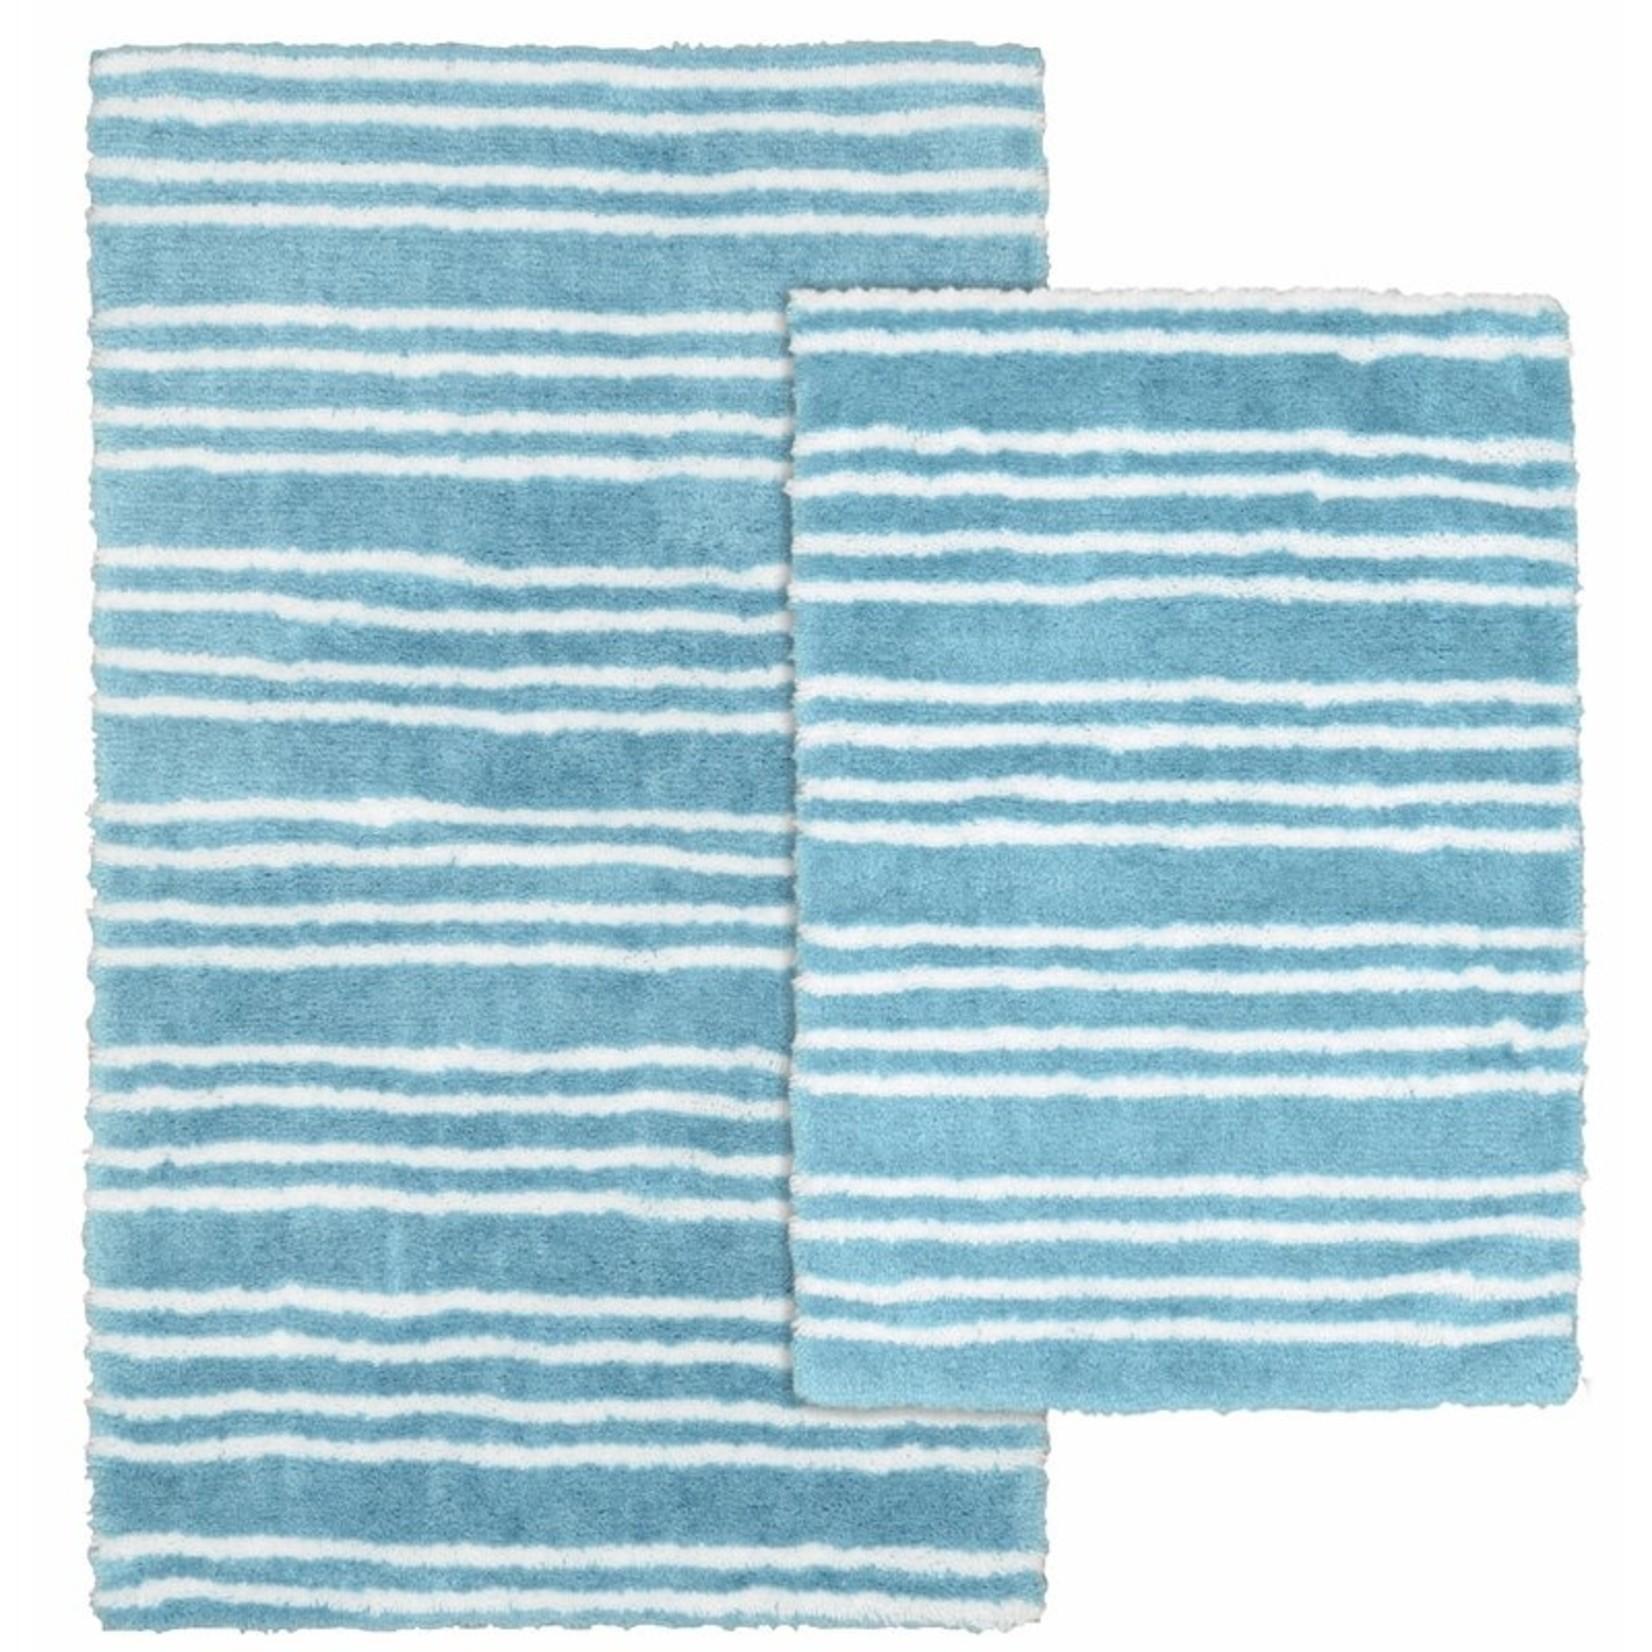 *Scurlock Washable Rectangle Non-Slip Striped 2-Piece Bath Rug Set